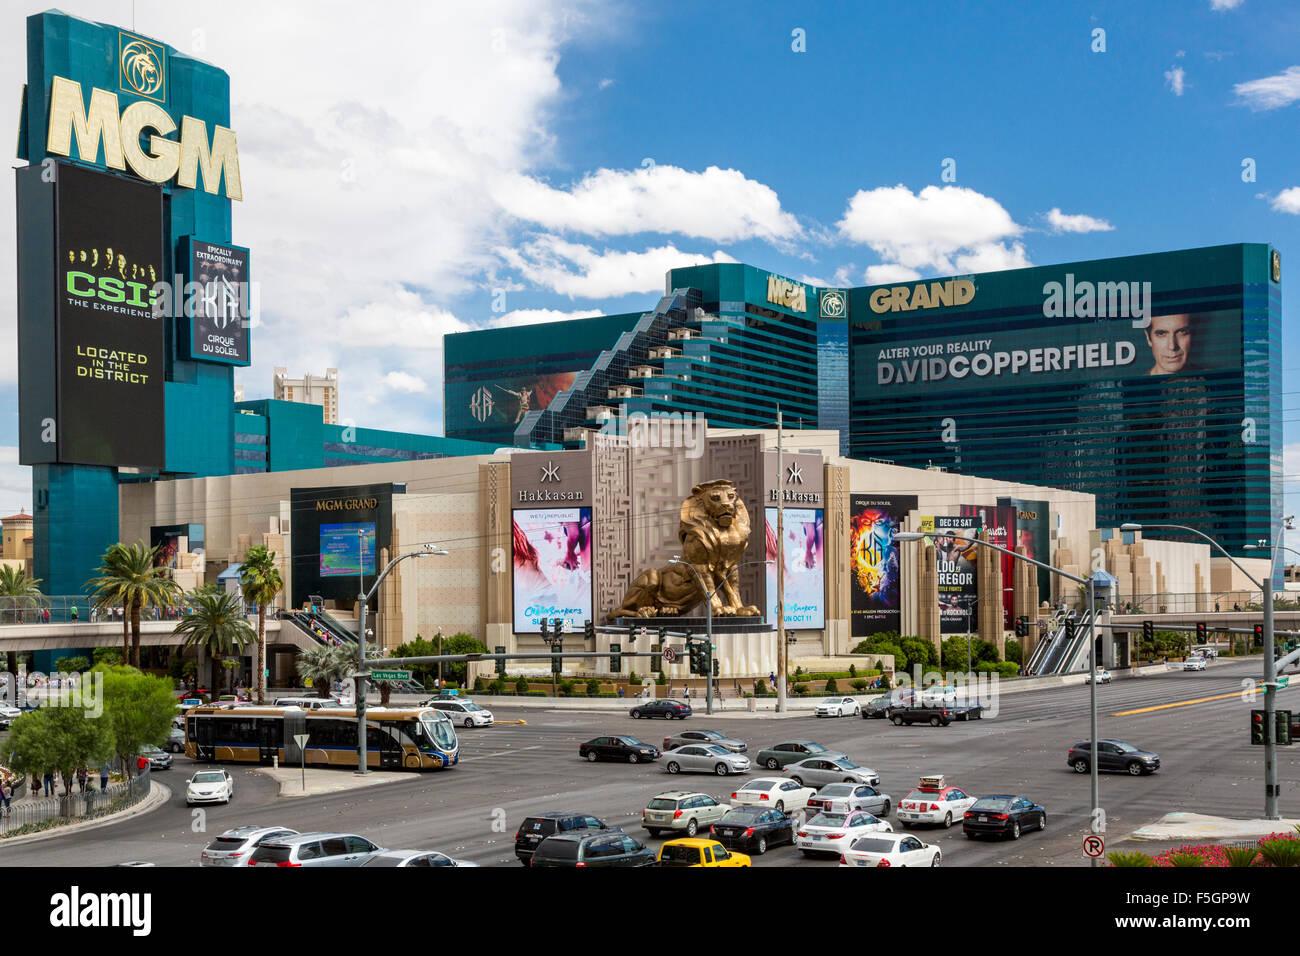 Las Vegas, Nevada.  MGM Grand Hotel and Casino, Corner of South Las Vegas Boulevard and Tropicana Avenue. - Stock Image